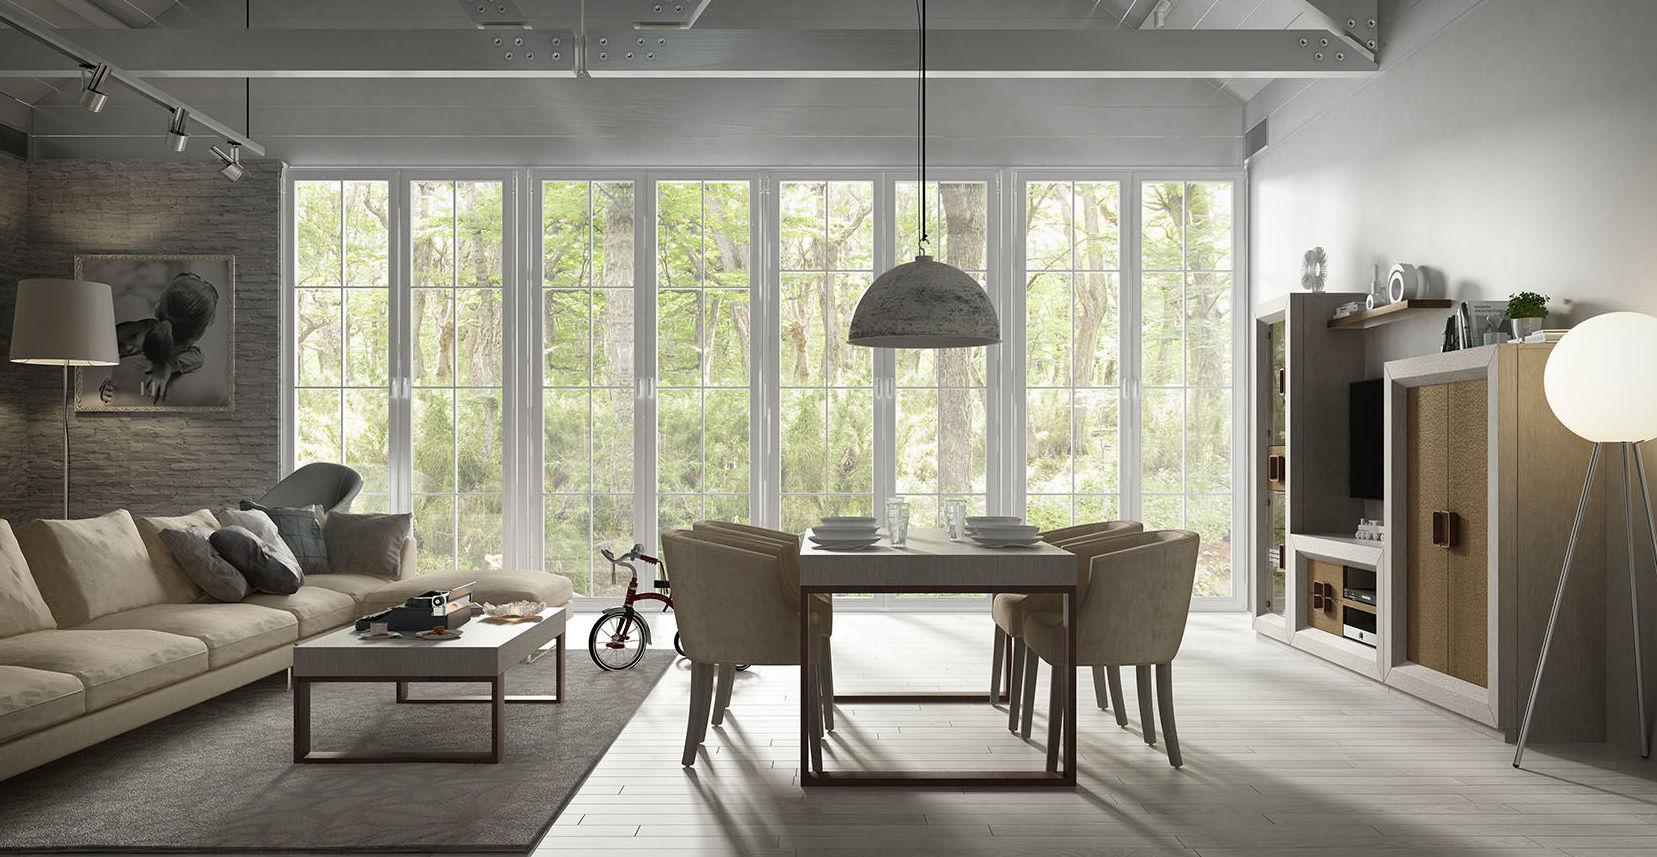 Franco furniture colecci n enzo cat logo de muebles y for Mostrar muebles